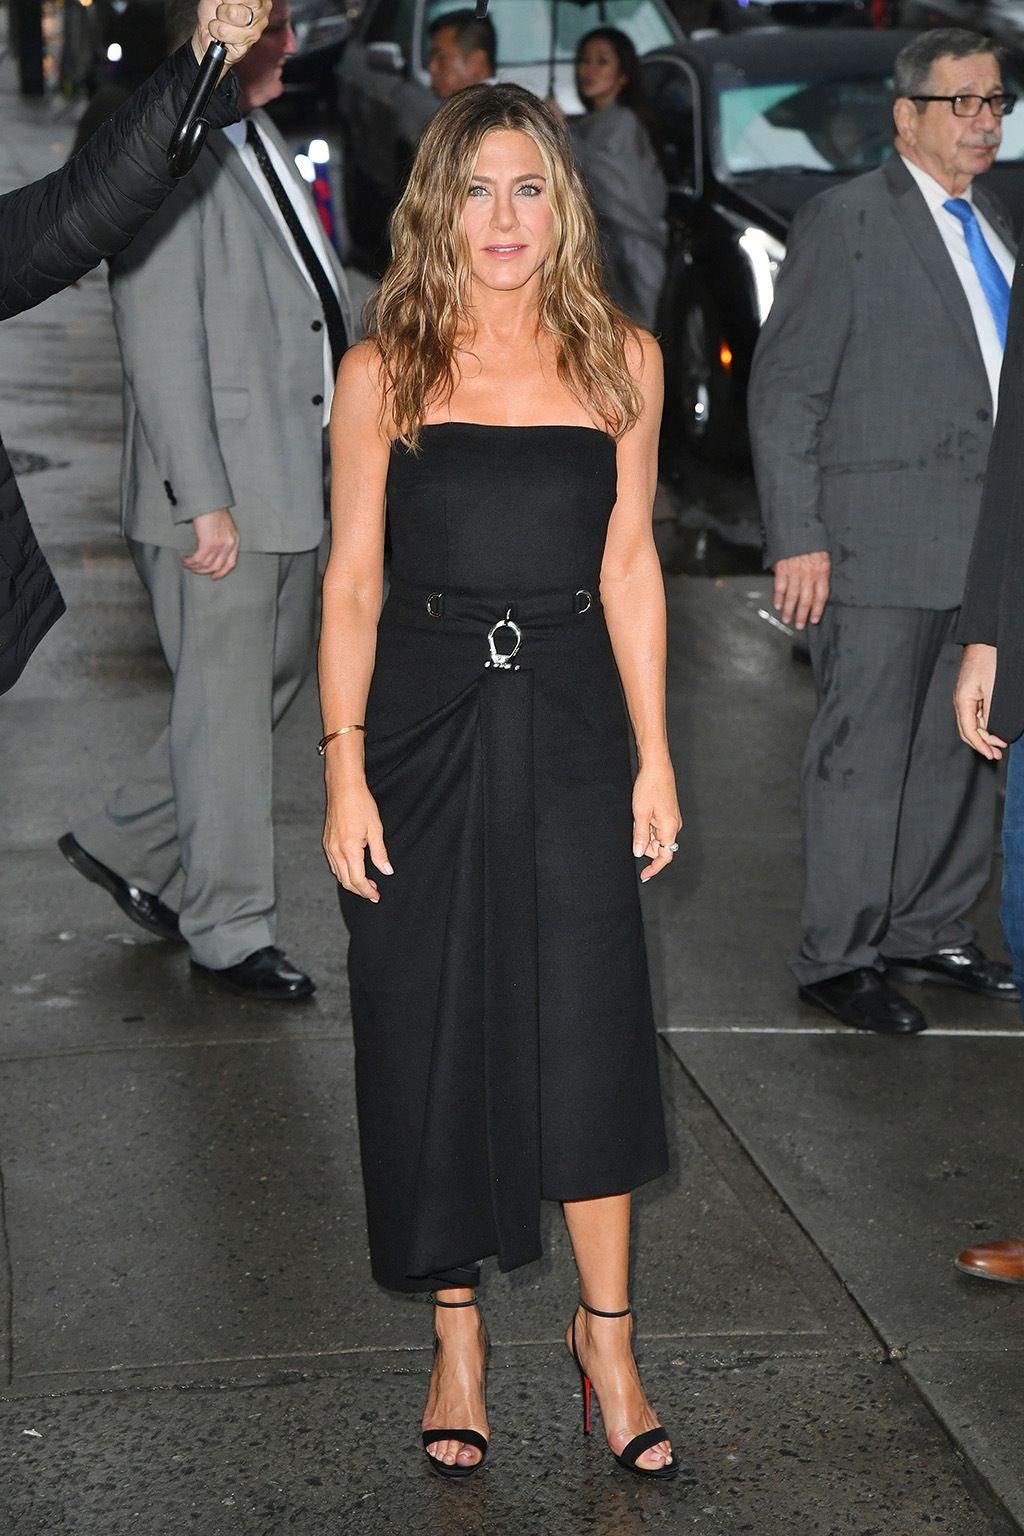 Jennifer Aniston Wears Prada Dress Louboutin Sandals In Nyc Jennifer Aniston Dress Jennifer Aniston Style Dresses [ 1536 x 1024 Pixel ]